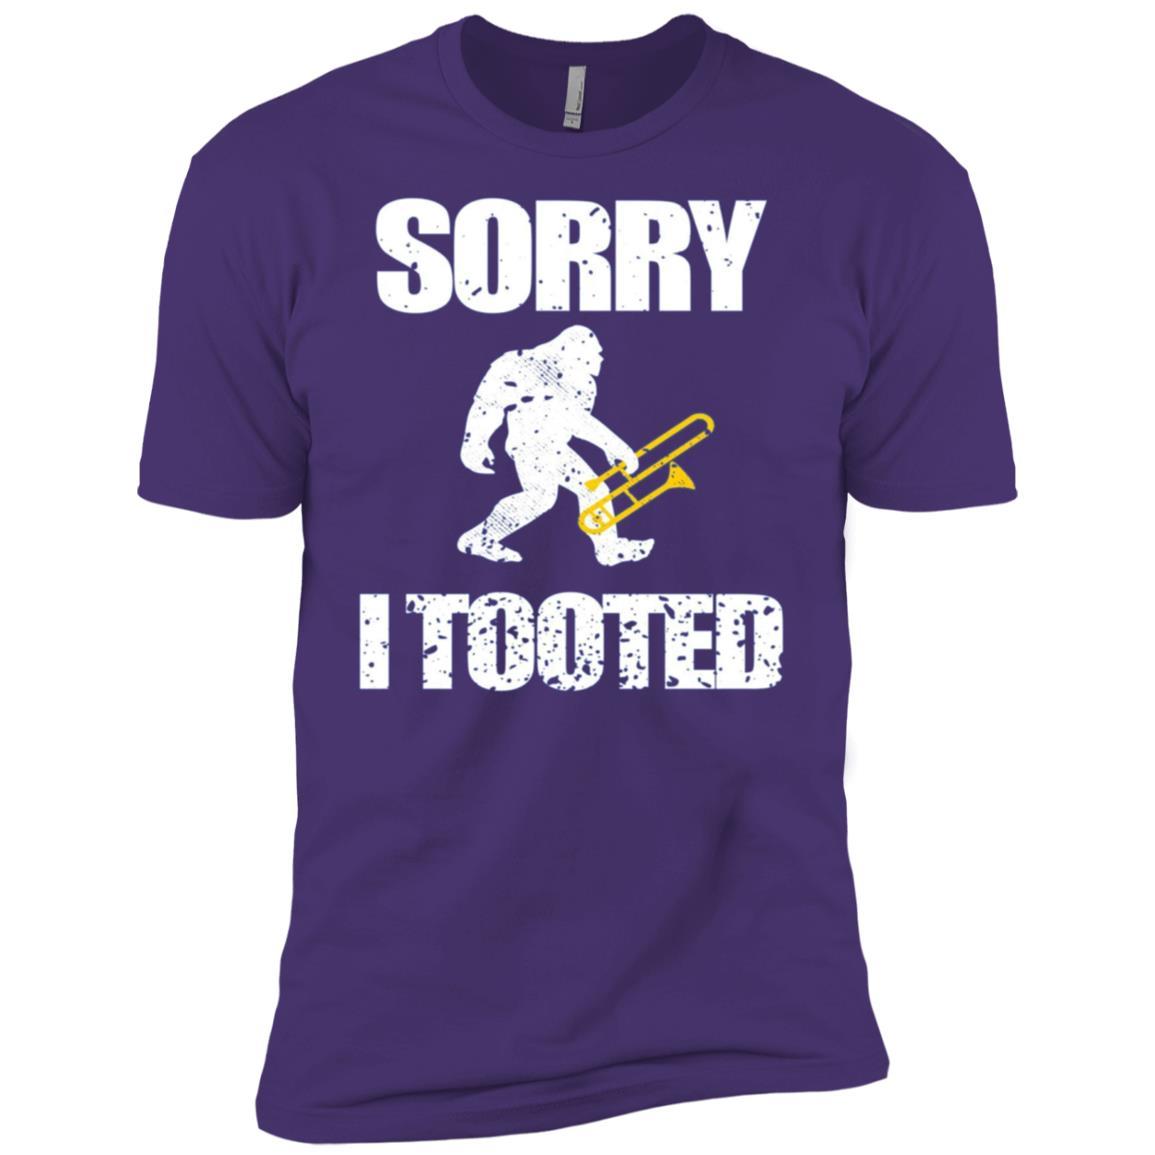 Funny Trombone Cool Bigfoot Gift Men Women Kids-1 Men Short Sleeve T-Shirt